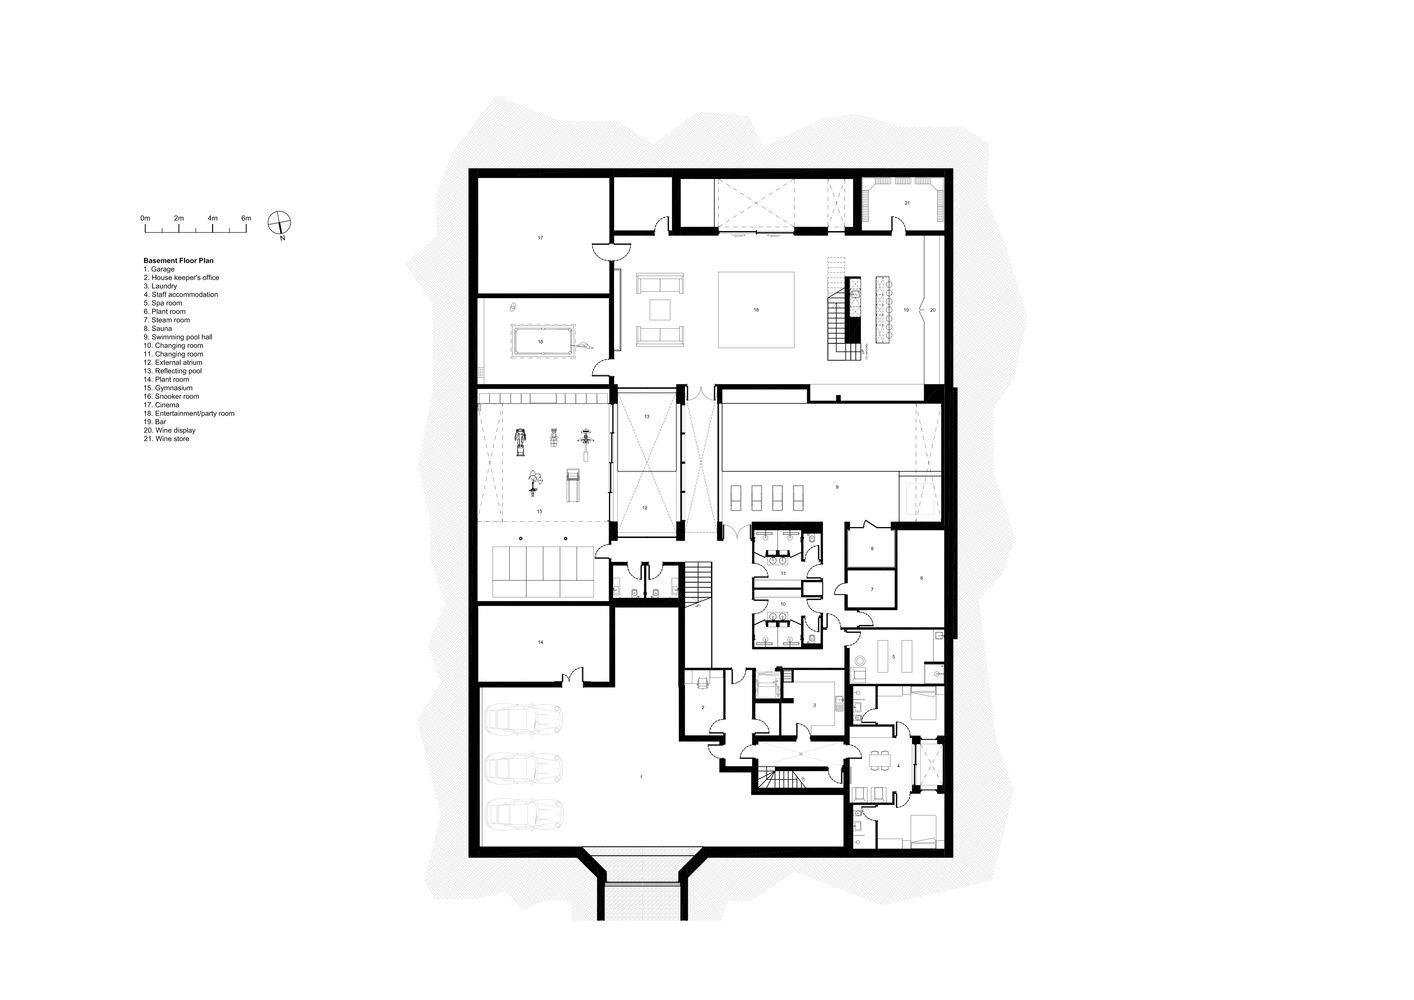 Gallery Of Jura Lewandowski Architects 30 Basement Plans Lewandowski Ground Floor Plan